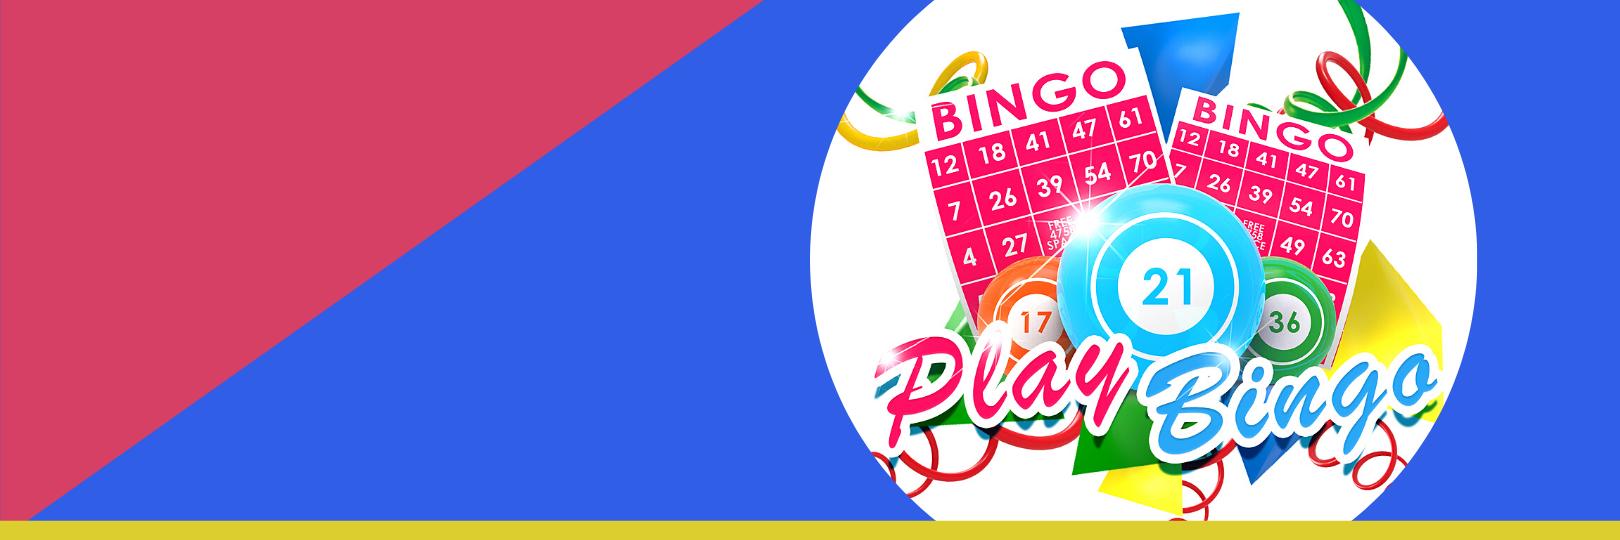 "</a>                                                                                                                                                                                       <span class=""slider_description"">Virtual Bingo Tournament, Tuesday - December 8th @ 7:00 PM</span>                                                                                     <a href=""https://www.templebethemet.org/community/sisterhood#"" class=""slider_link""                             target=""_blank"">                             Learn More                            </a>"